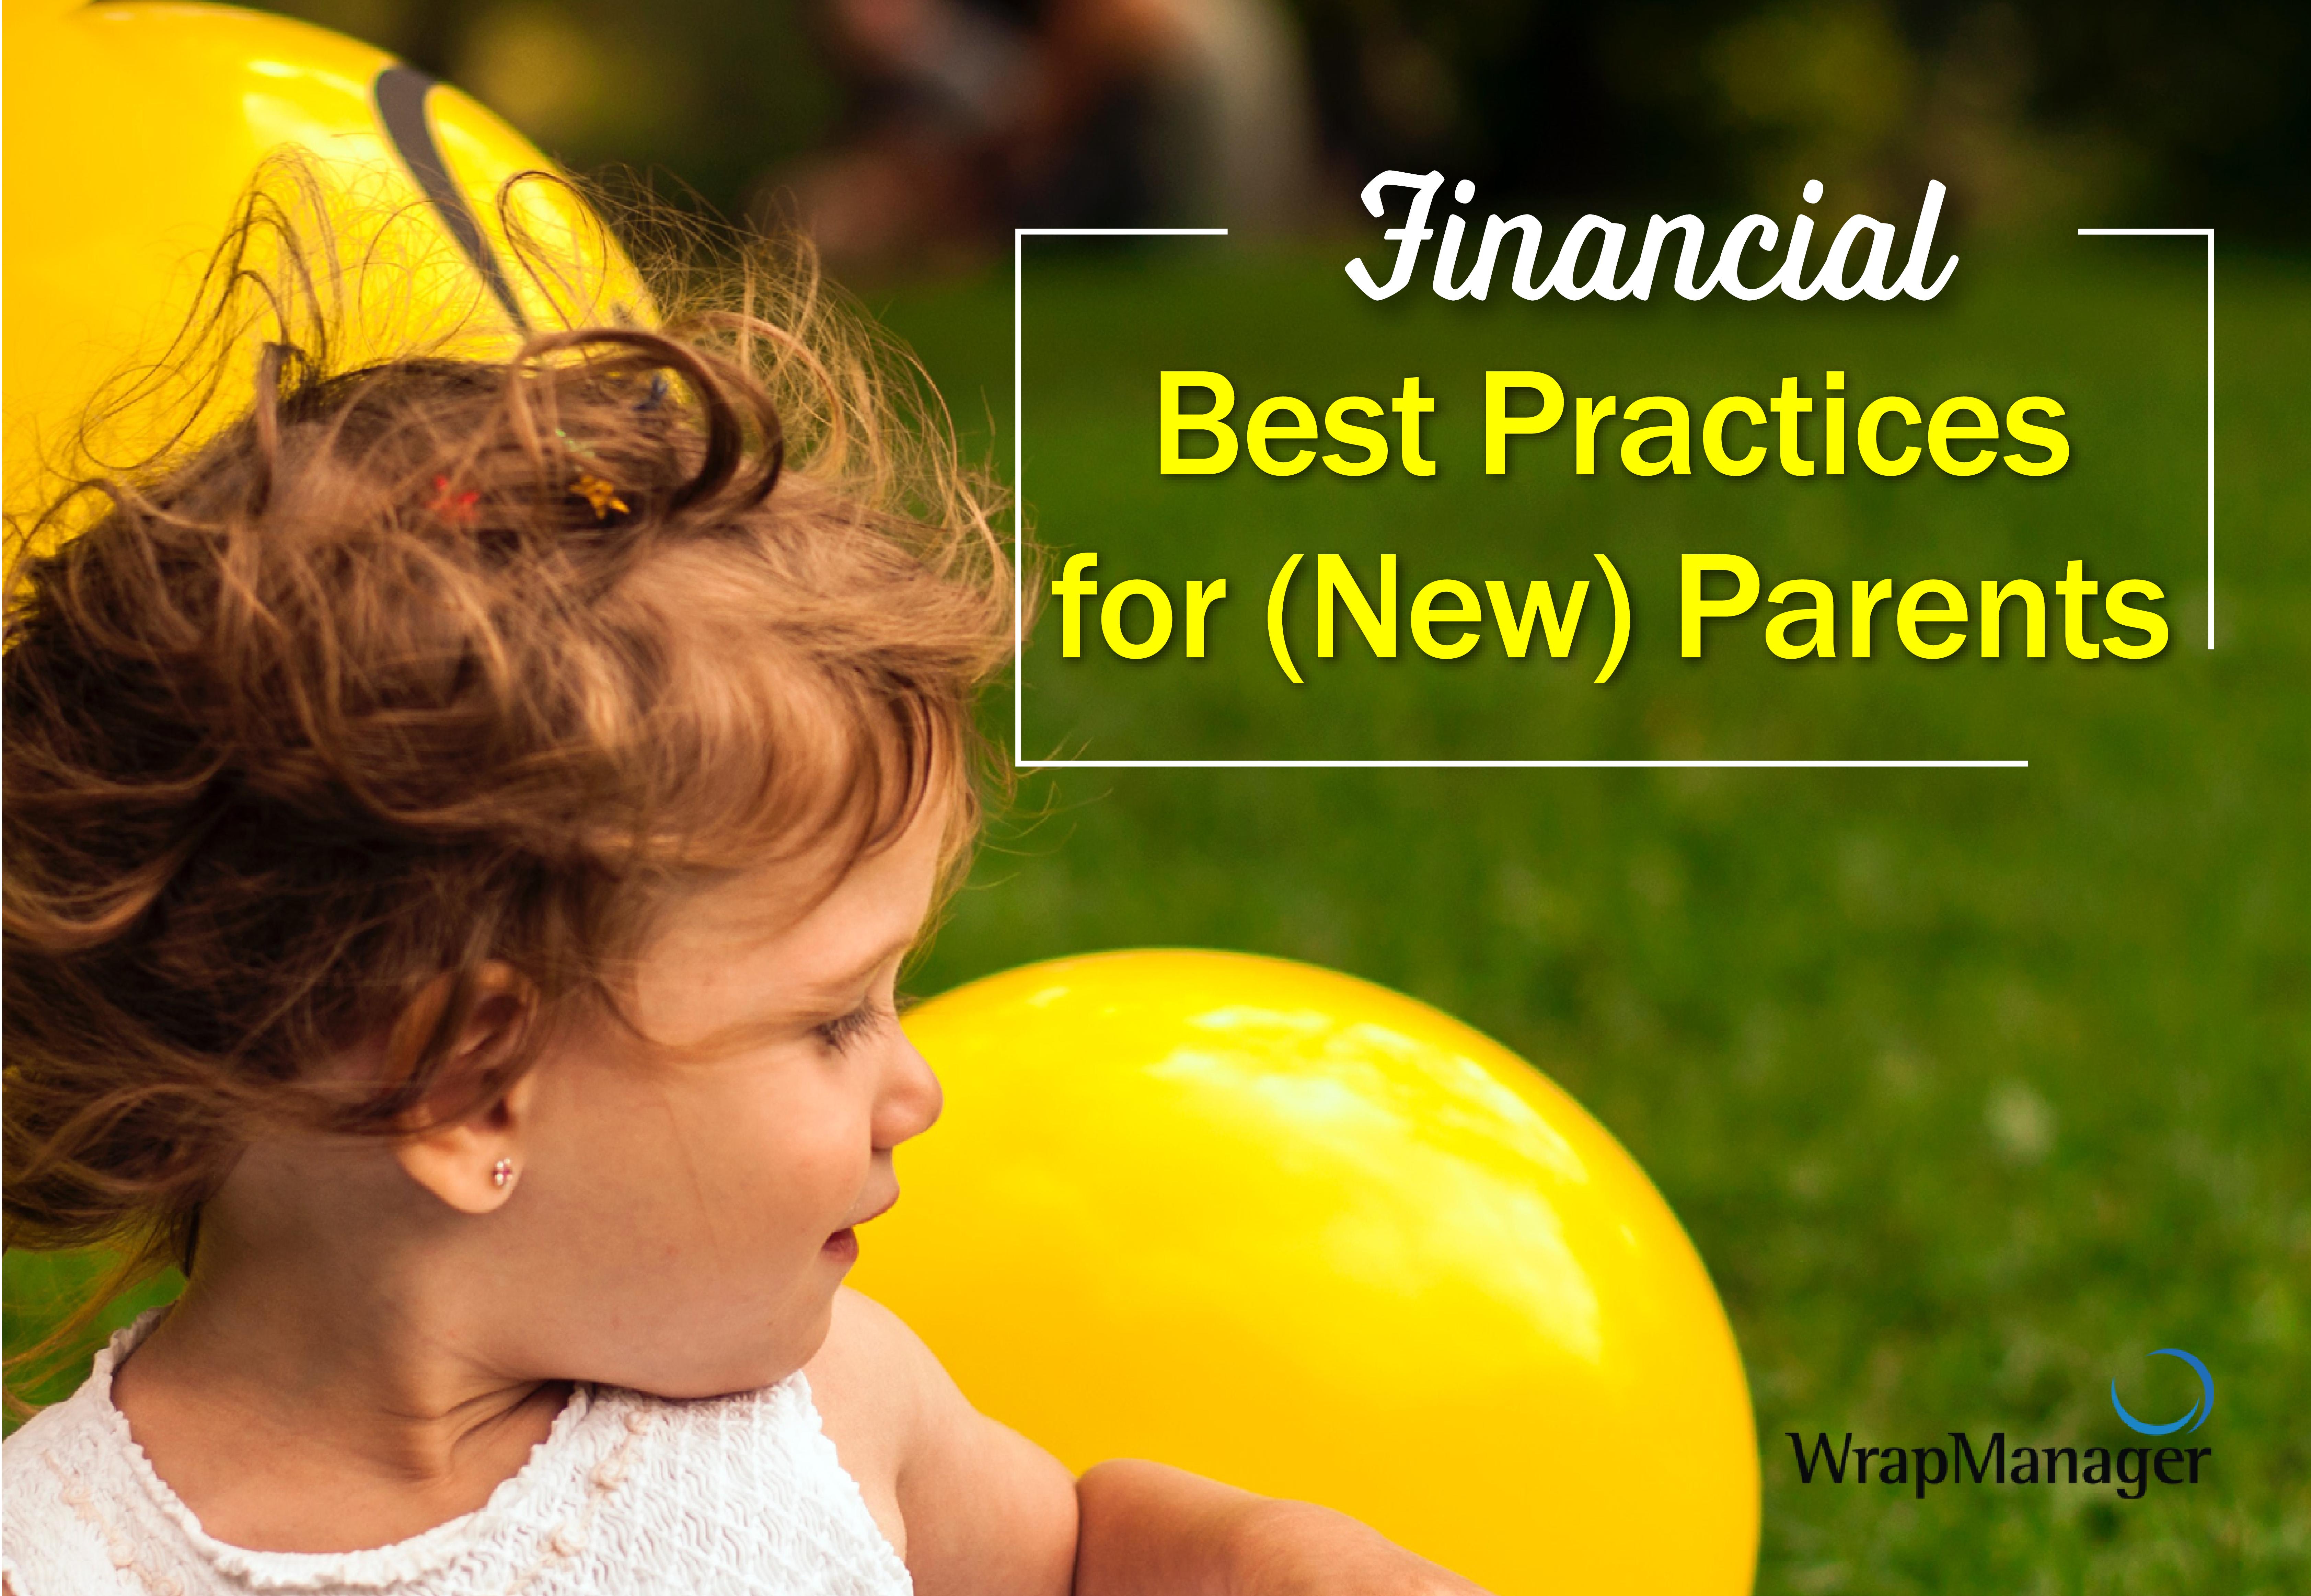 Financial Best Practices for Parents